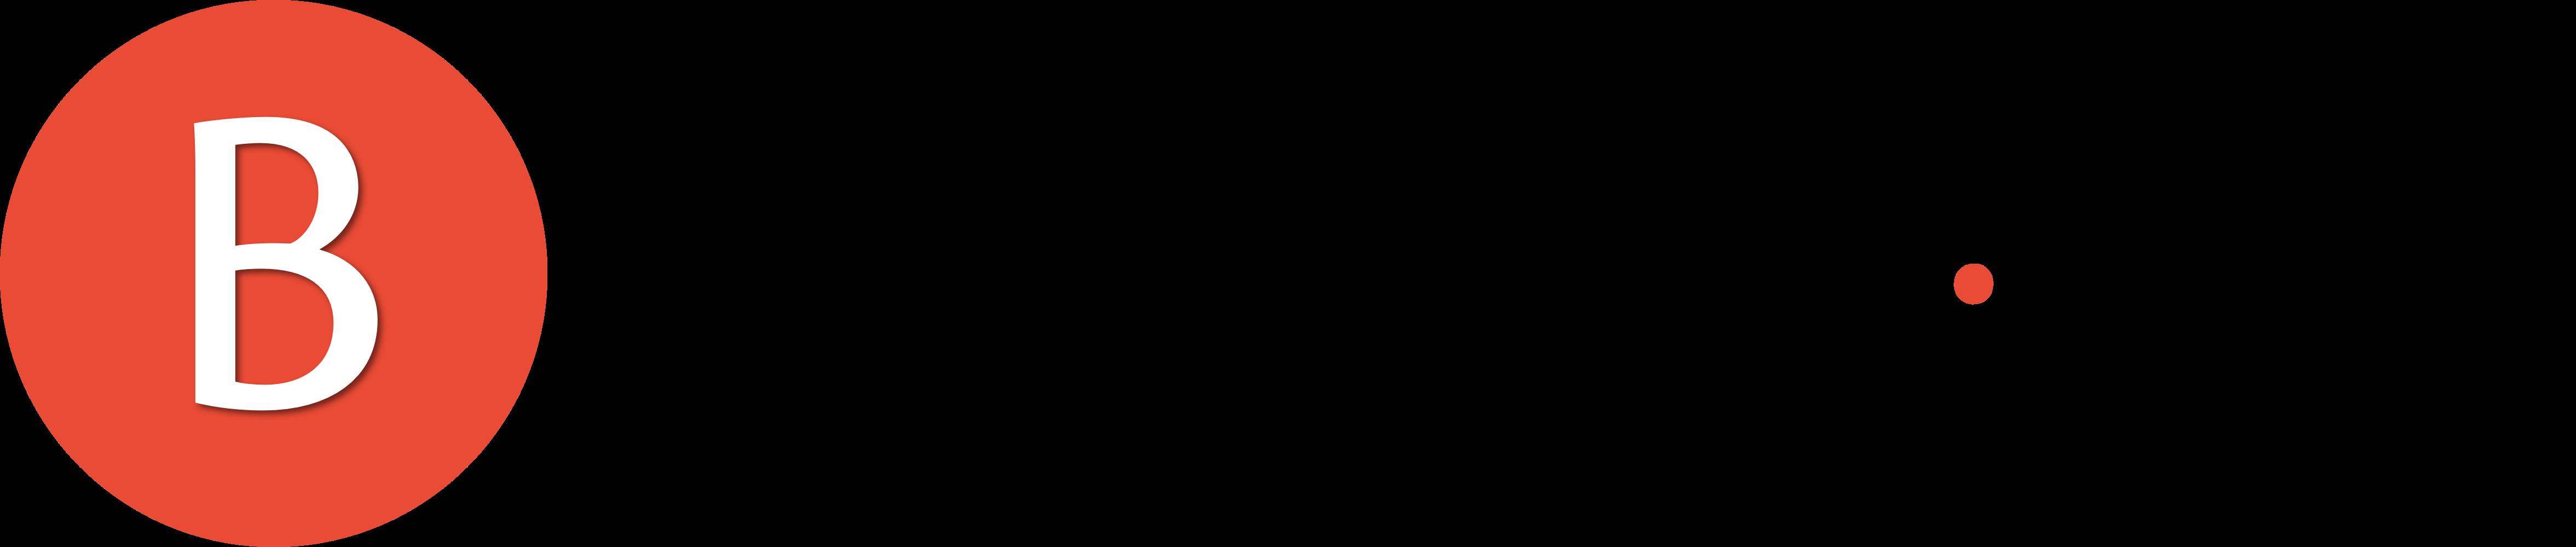 BiotechAsia_logo